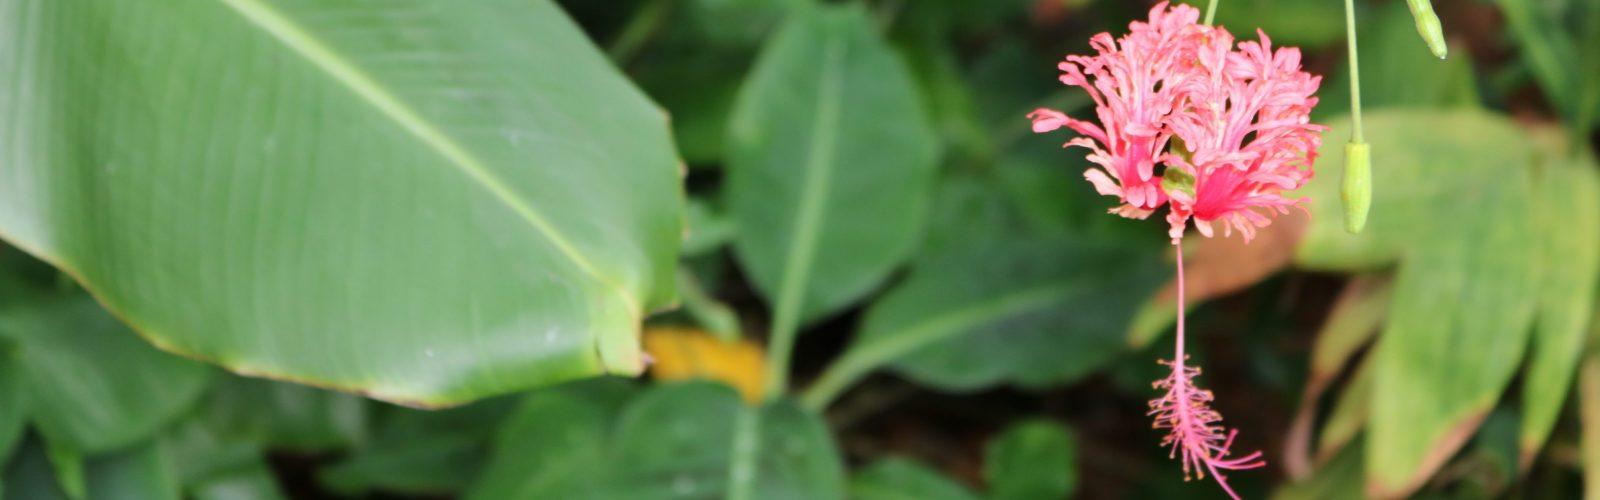 Fringed Rose-mallow (Hibiscus schizopetalus).